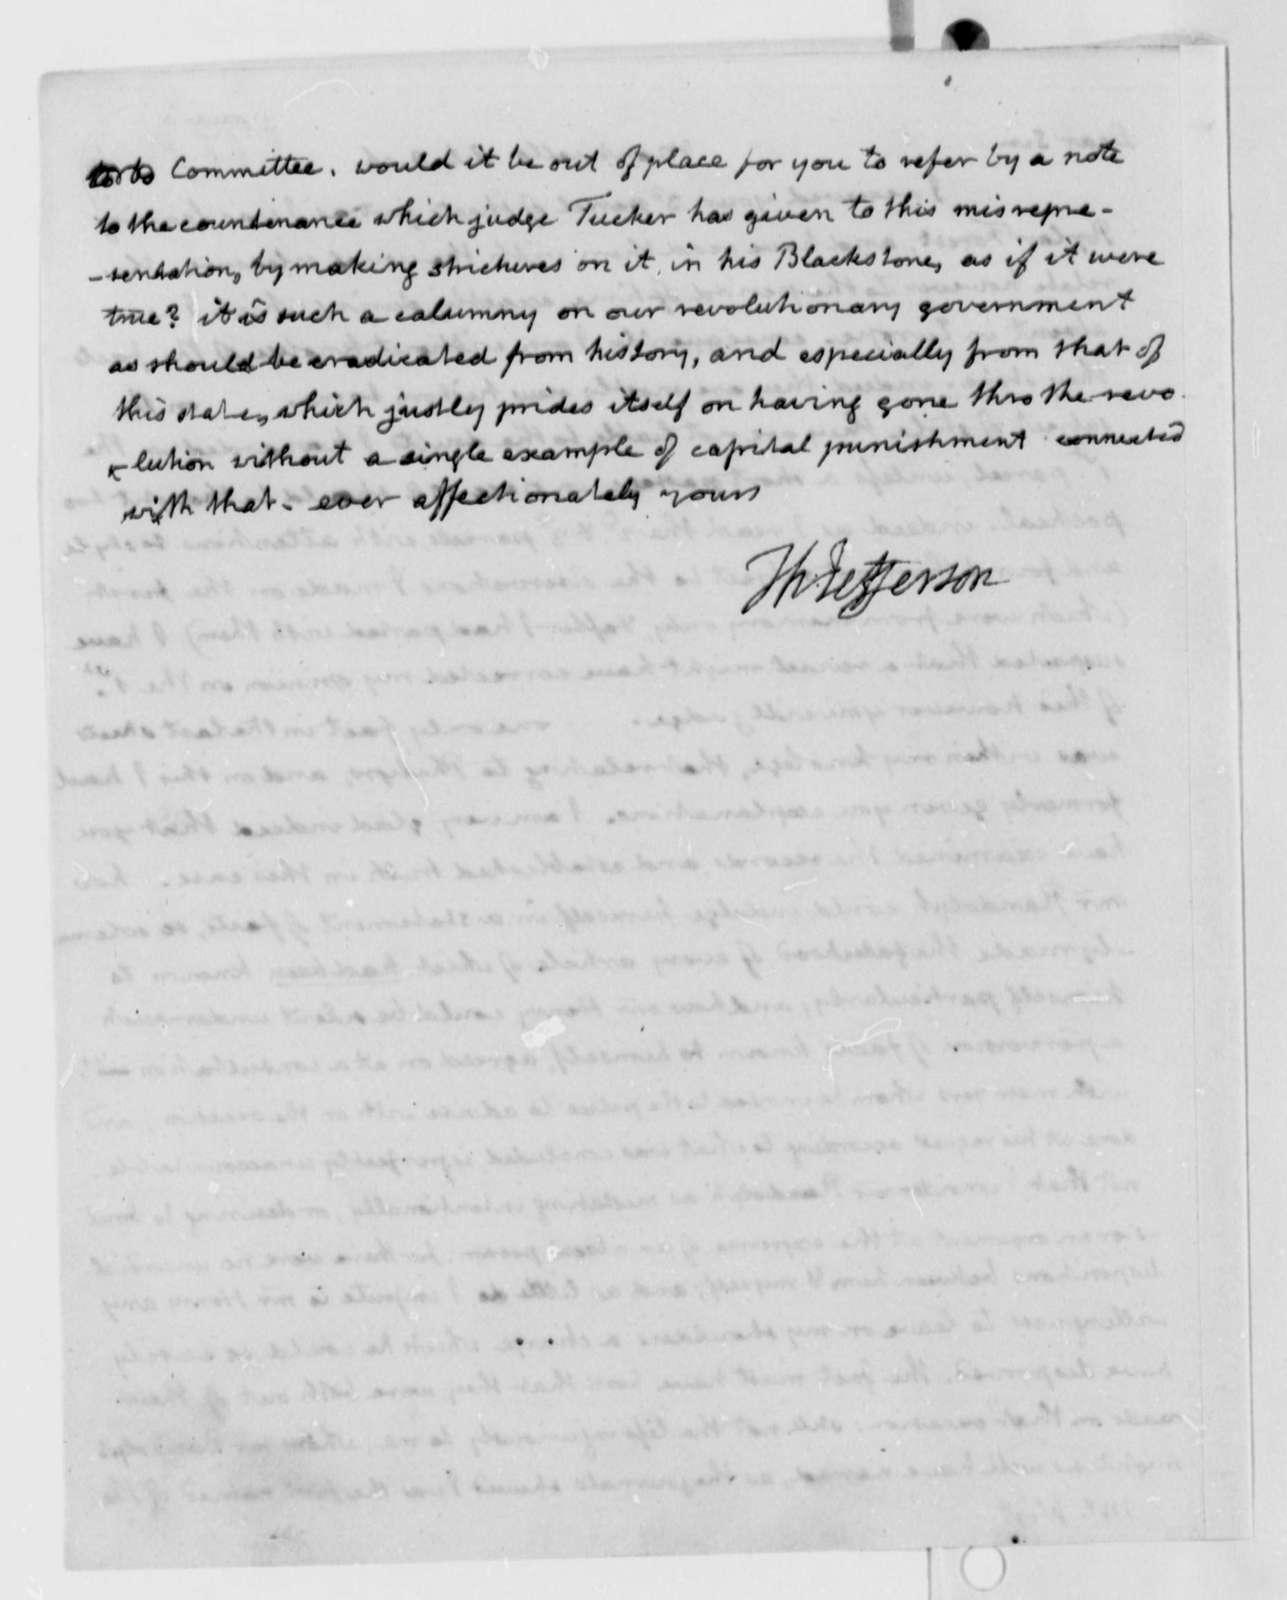 Thomas Jefferson to William Wirt, October 8, 1816